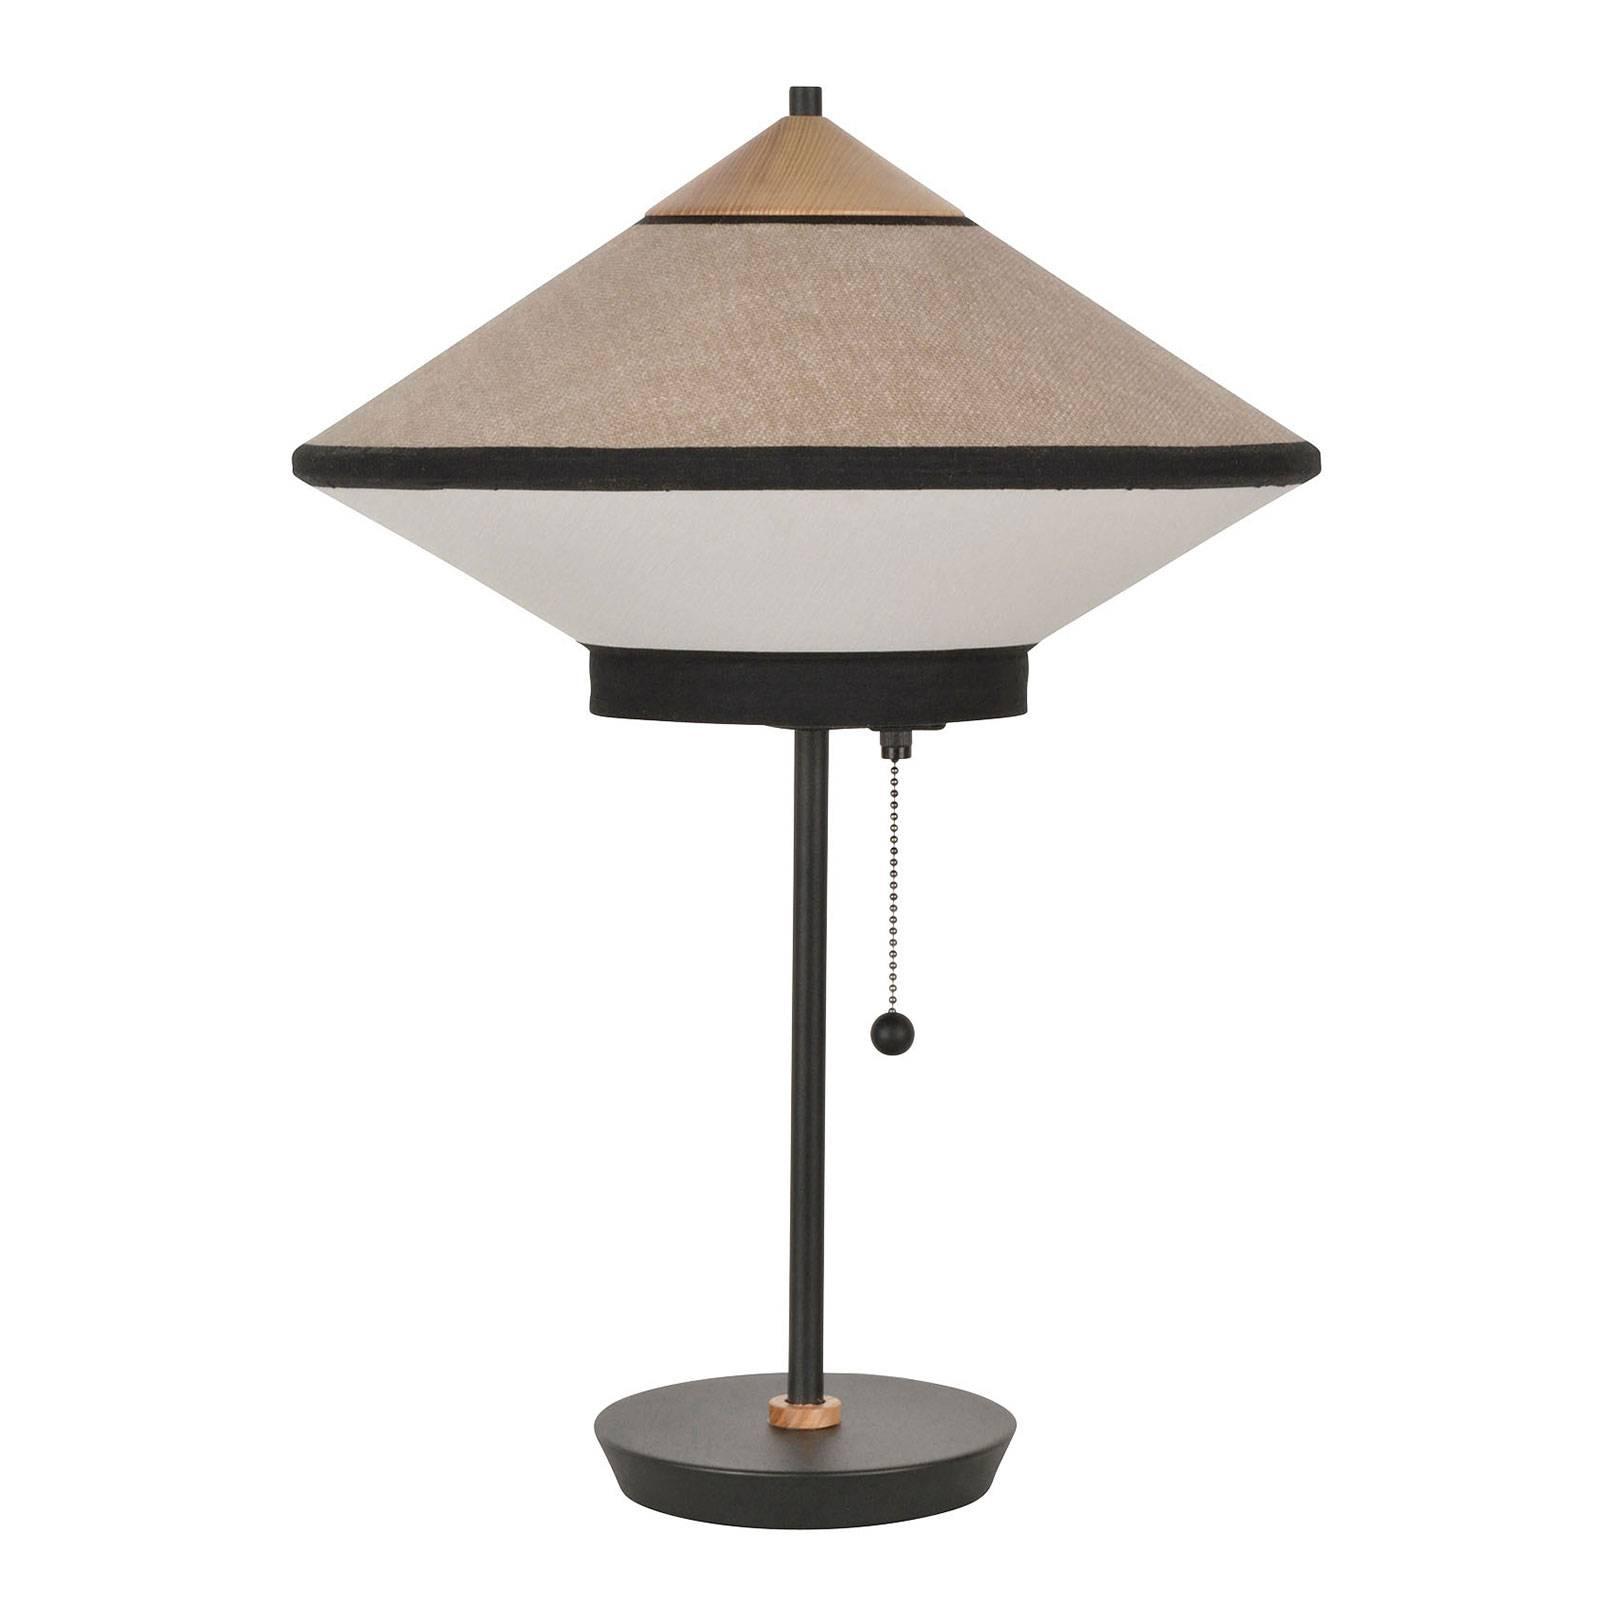 Forestier Cymbal S tafellamp, natuur